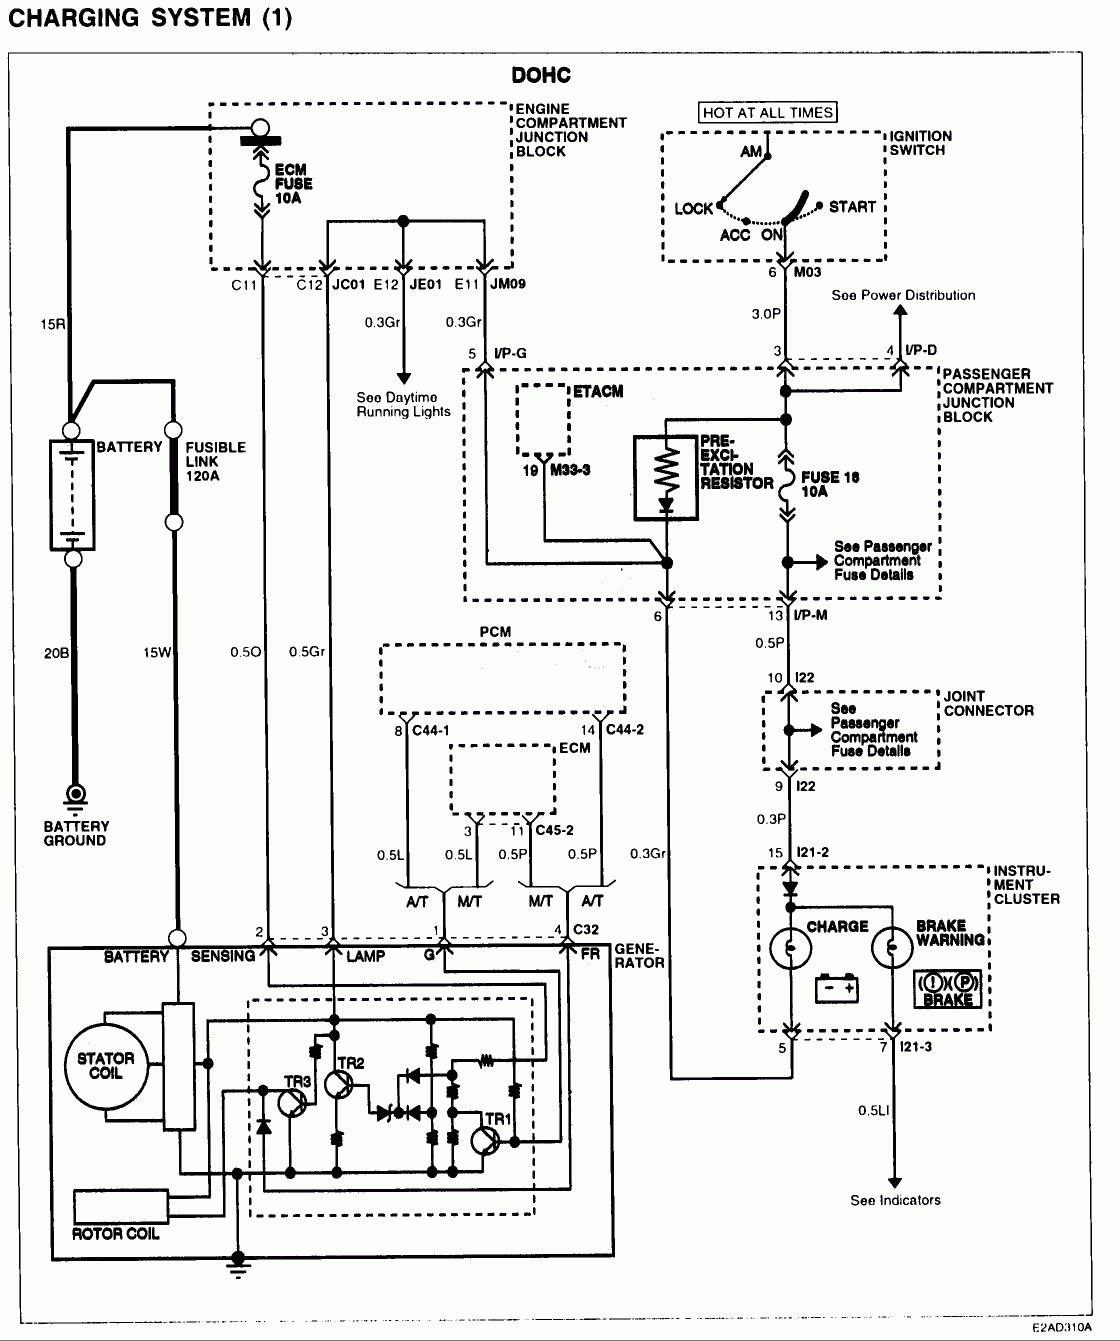 2001 hyundai santa fe parts diagram reviewmotors co2001 santa fe wiring schematic diagram